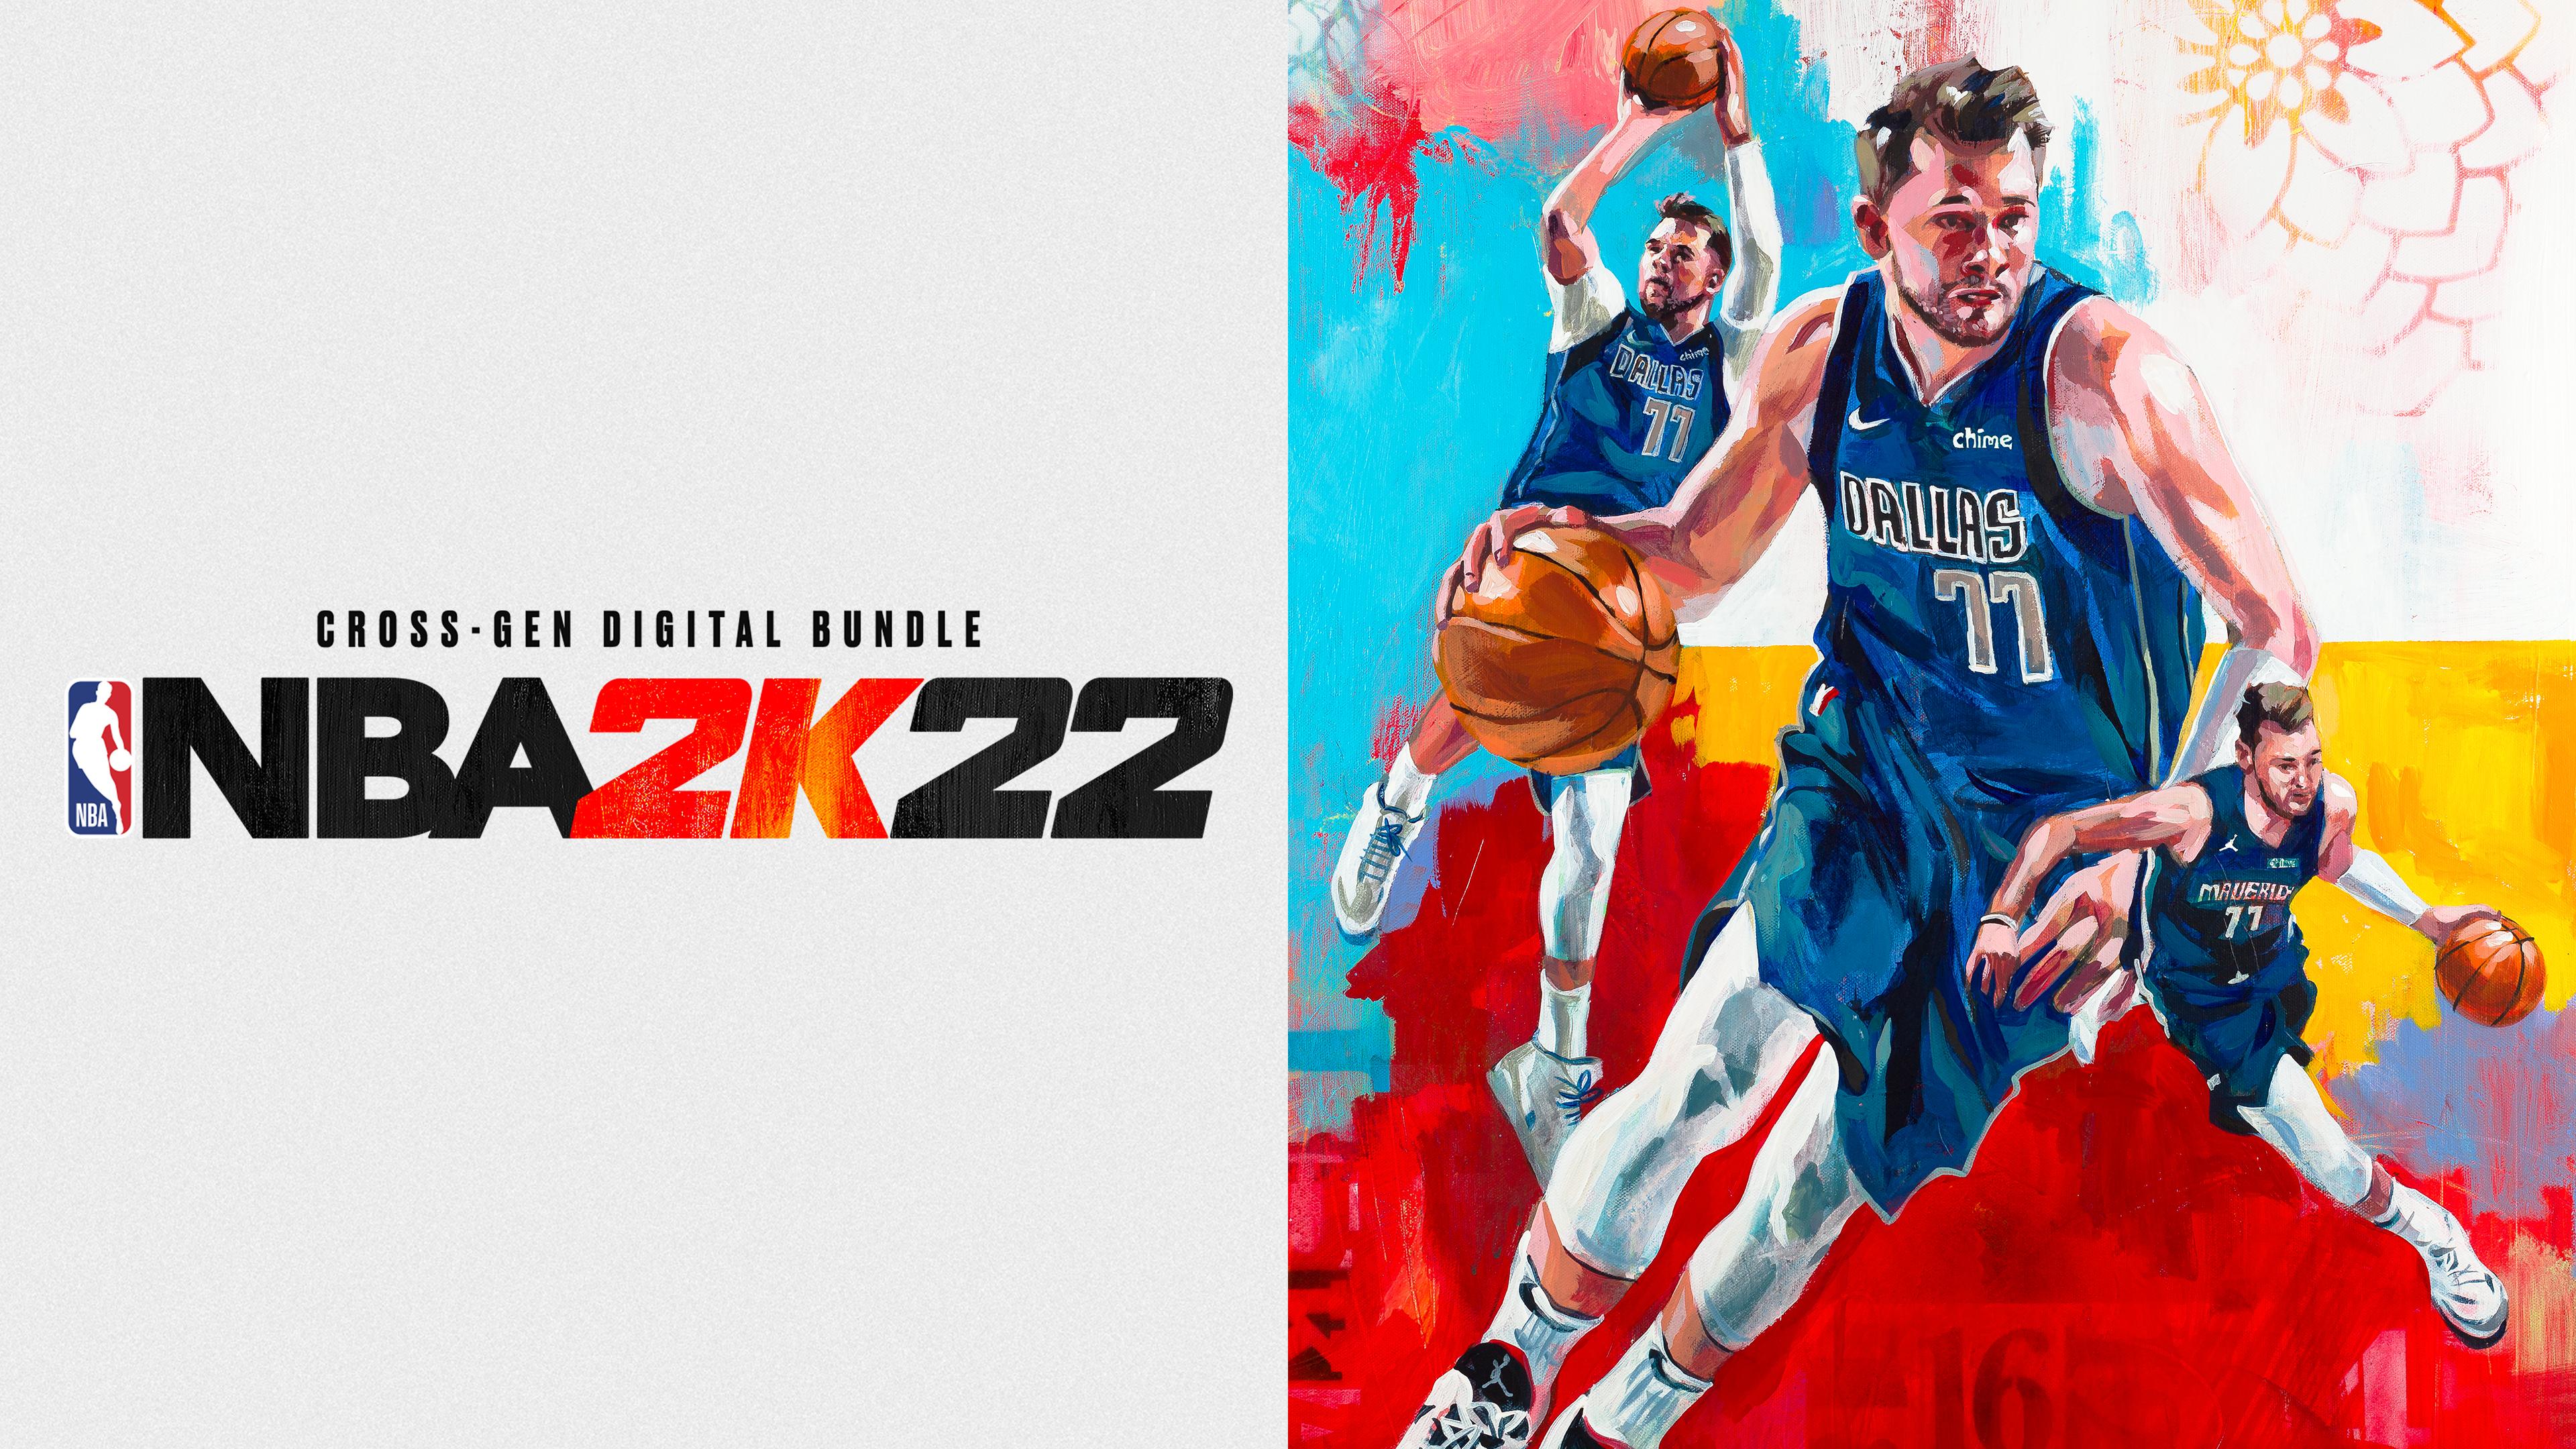 Скриншот №1 к Предзаказ набора NBA 2K22 Cross-Gen Digital Bundle для PS4 and PS5